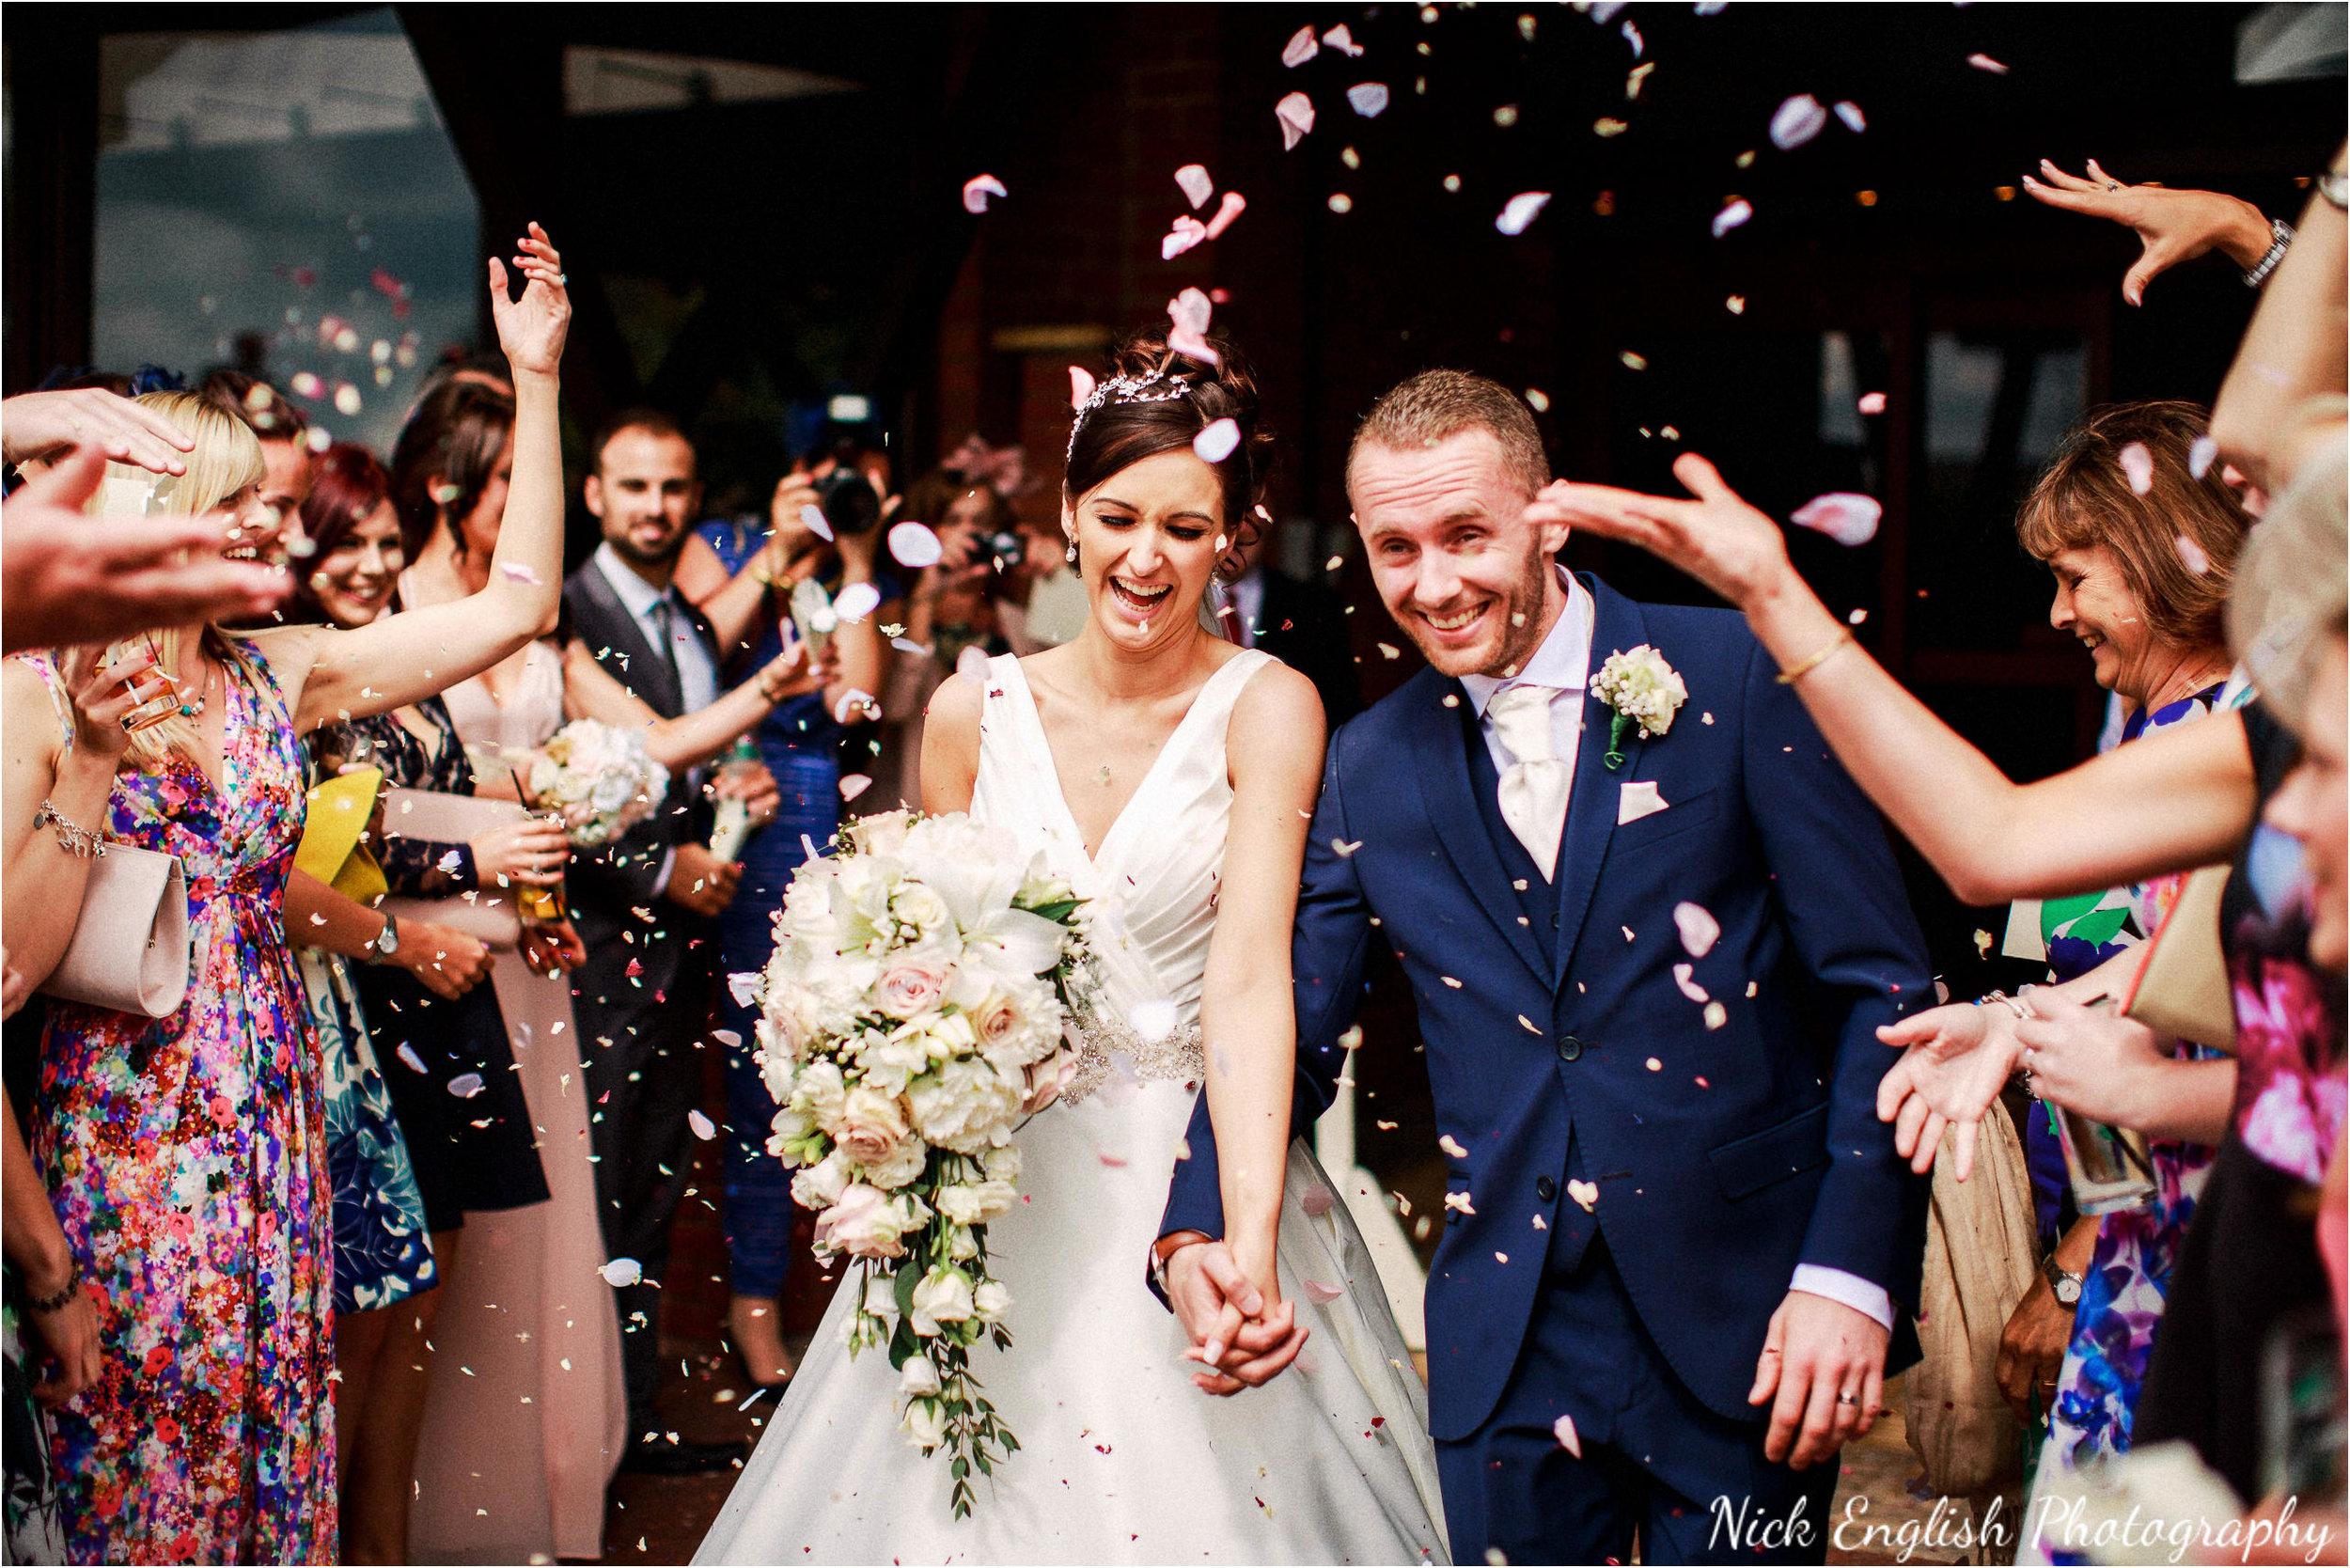 Emily David Wedding Photographs at Barton Grange Preston by Nick English Photography 152jpg.jpeg